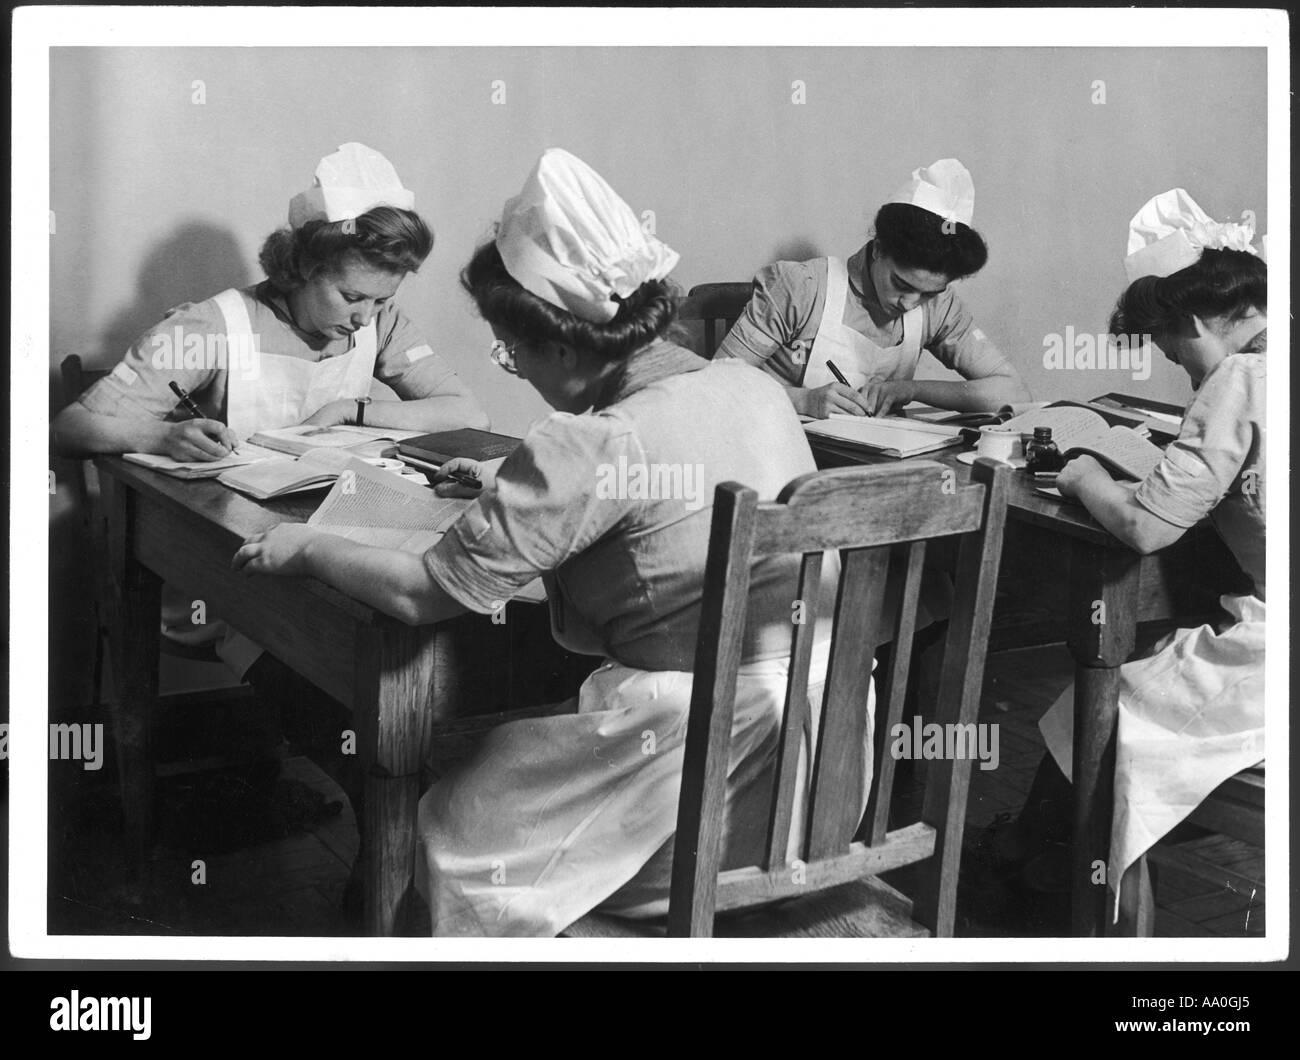 Student Nurses 1940s - Stock Image